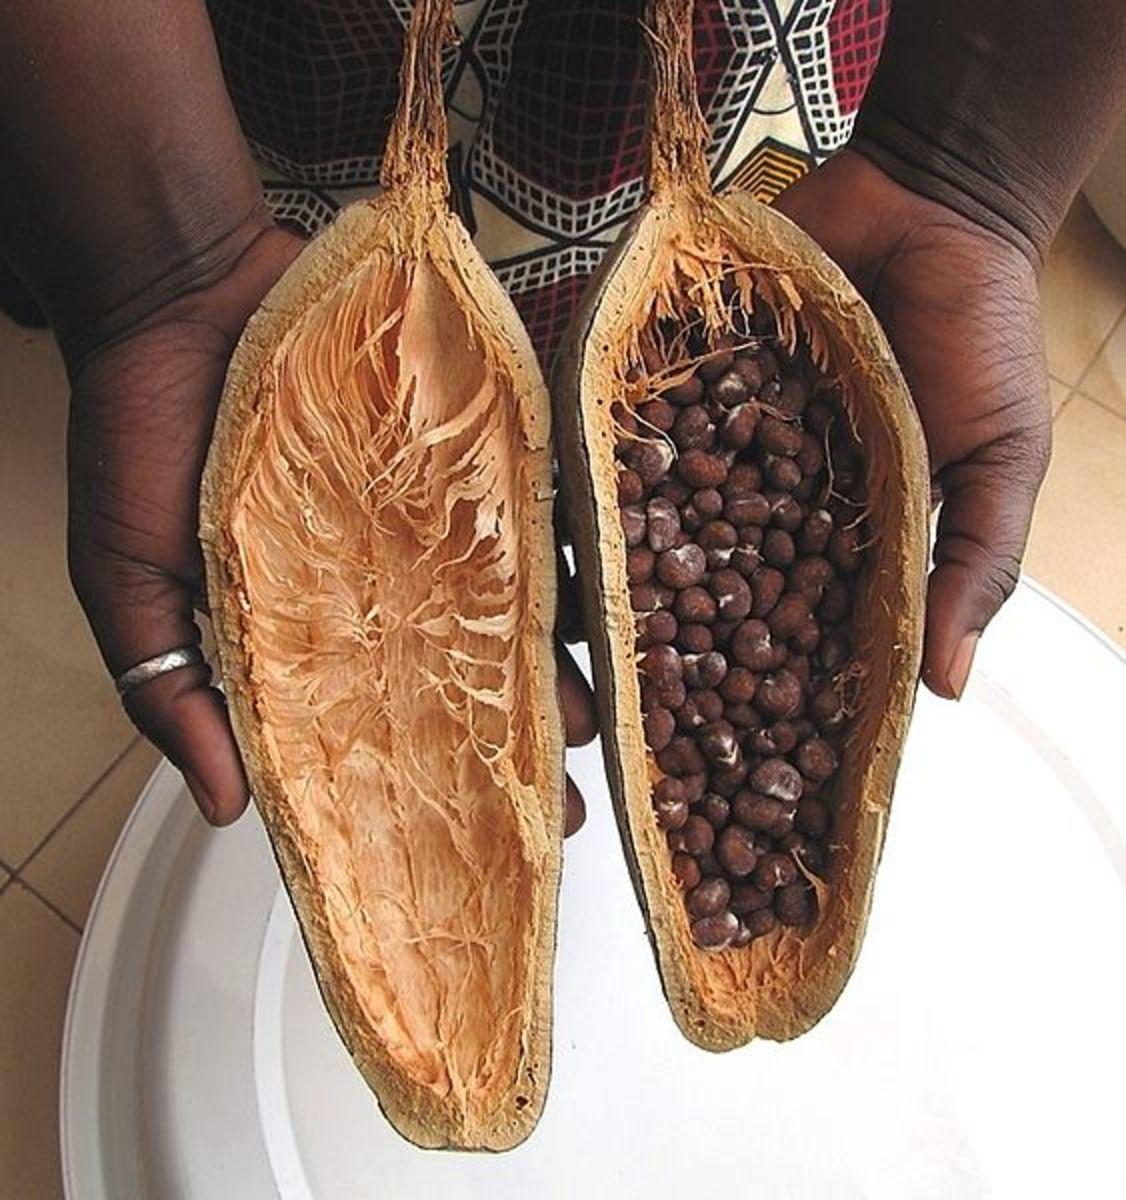 Baobab Fruit with Seeds